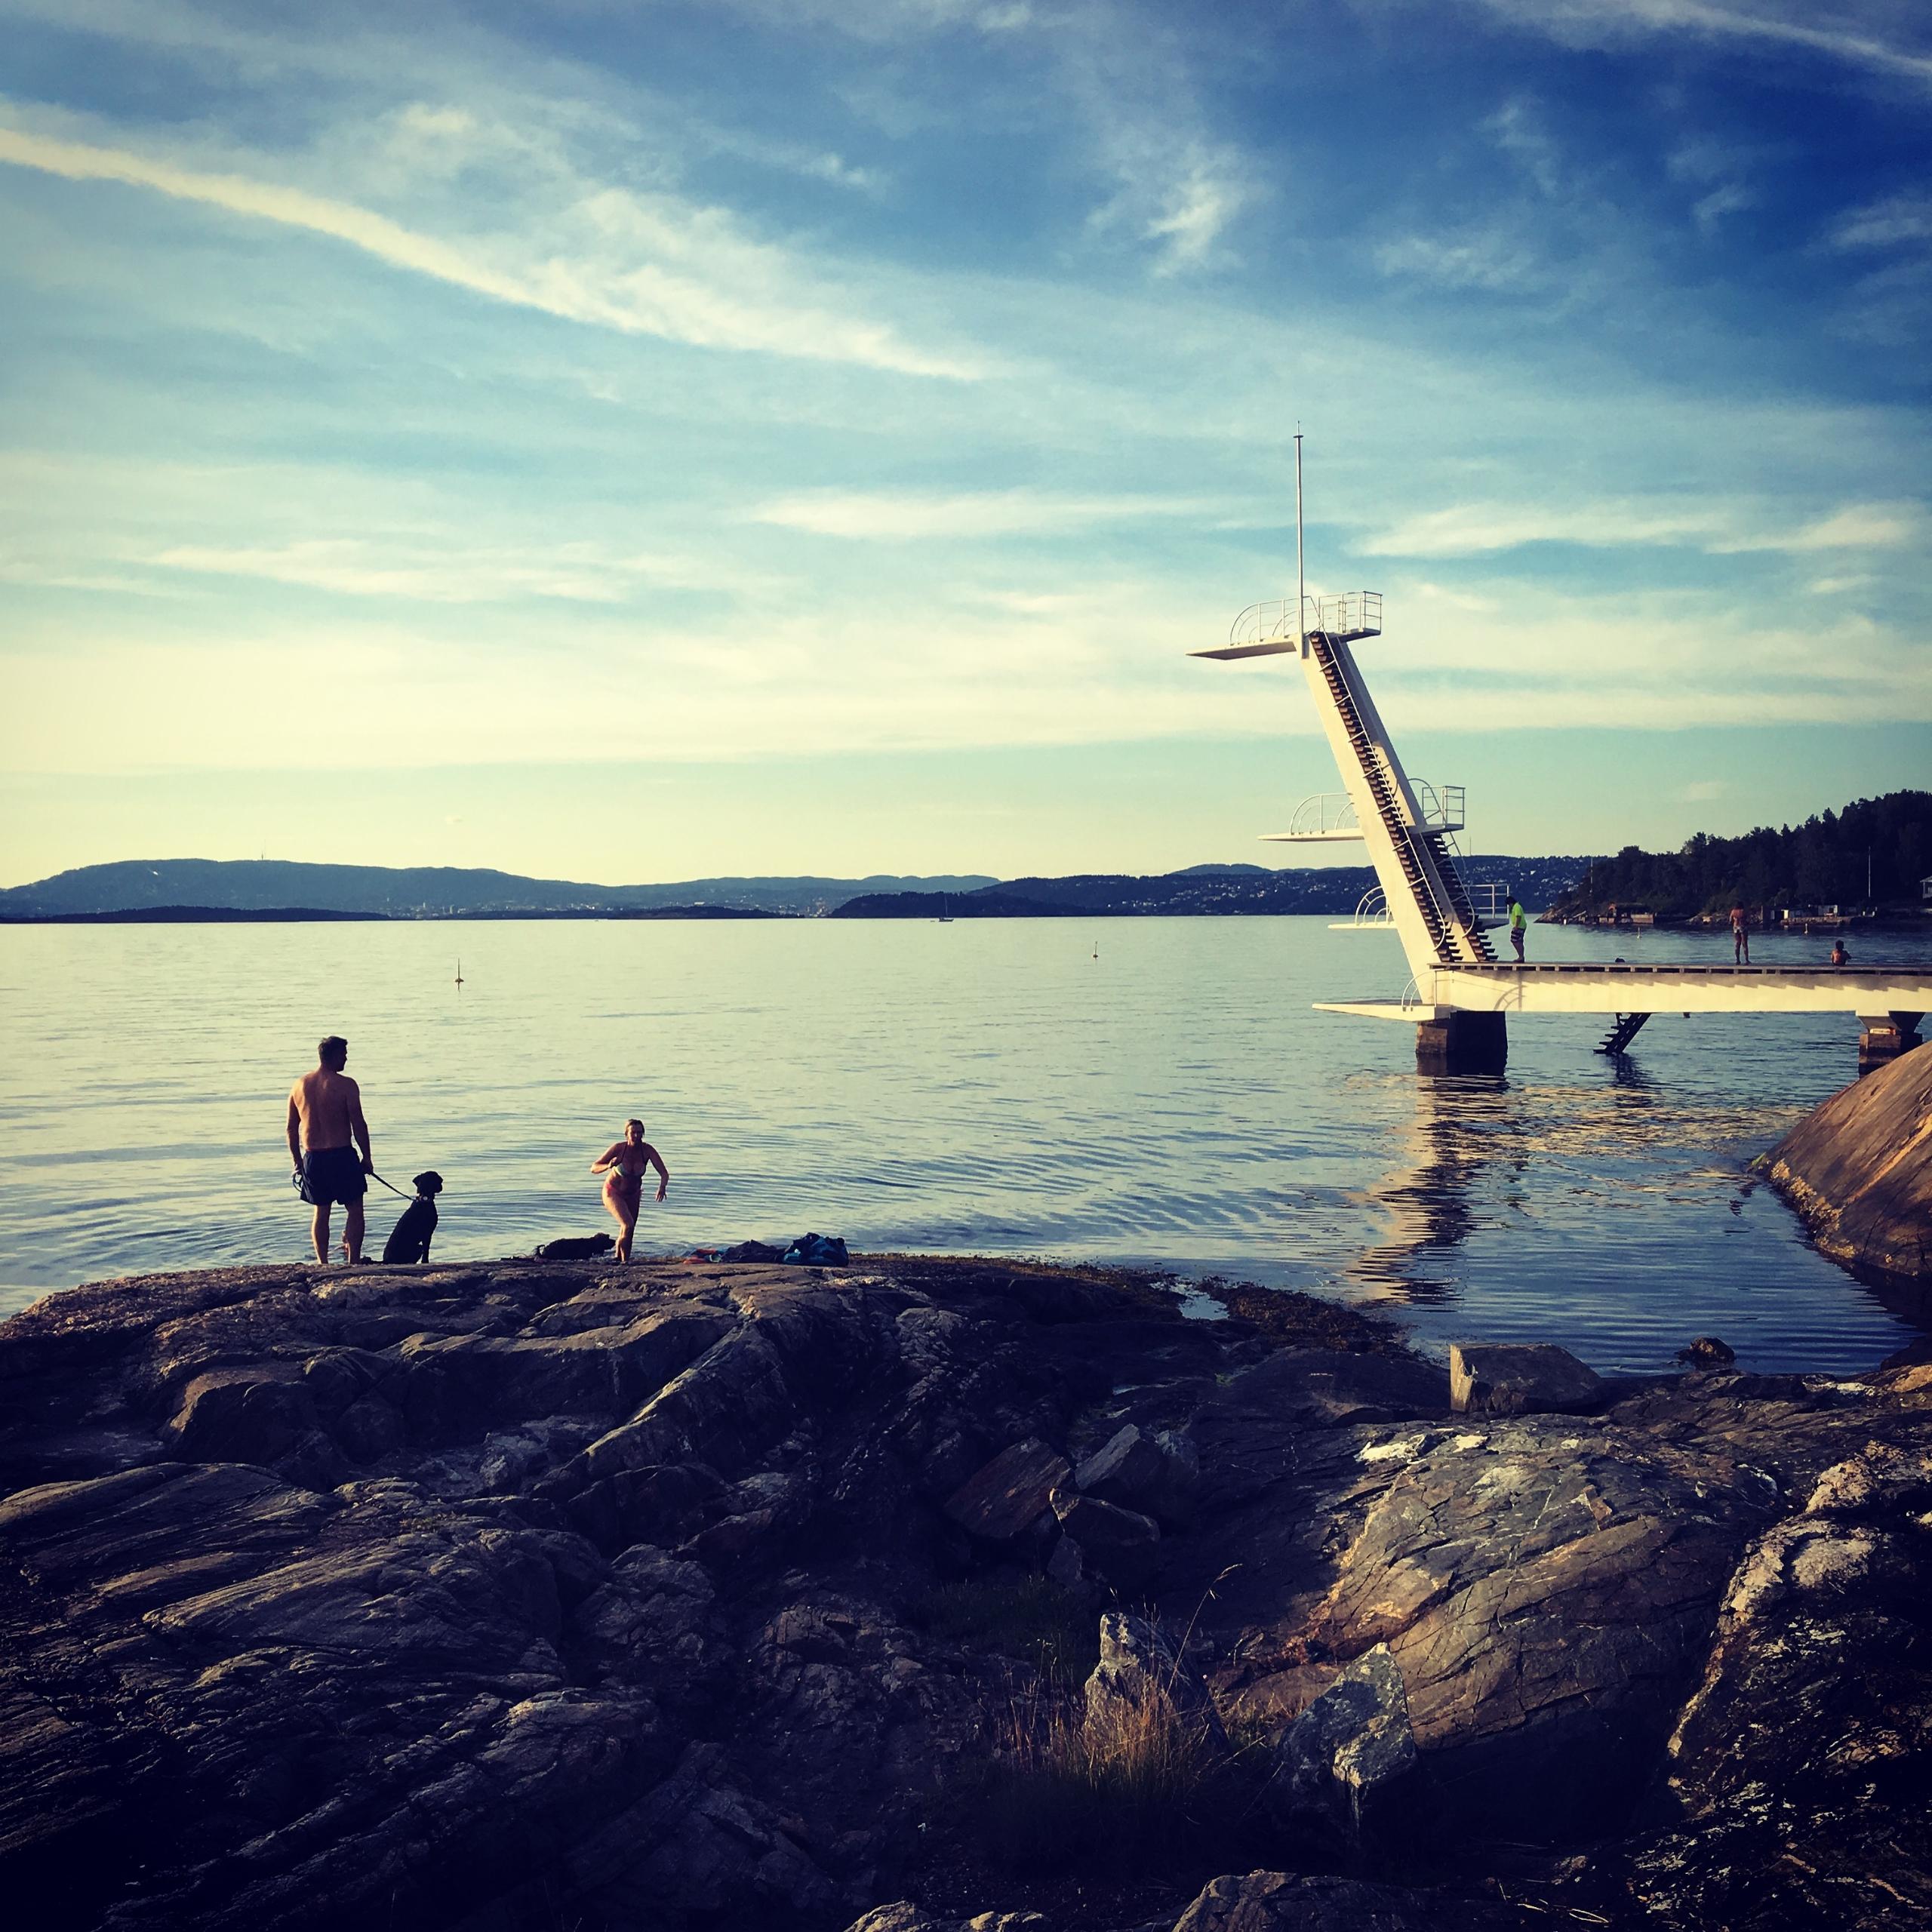 Ingierstrand bath place swiming - stigergutt | ello